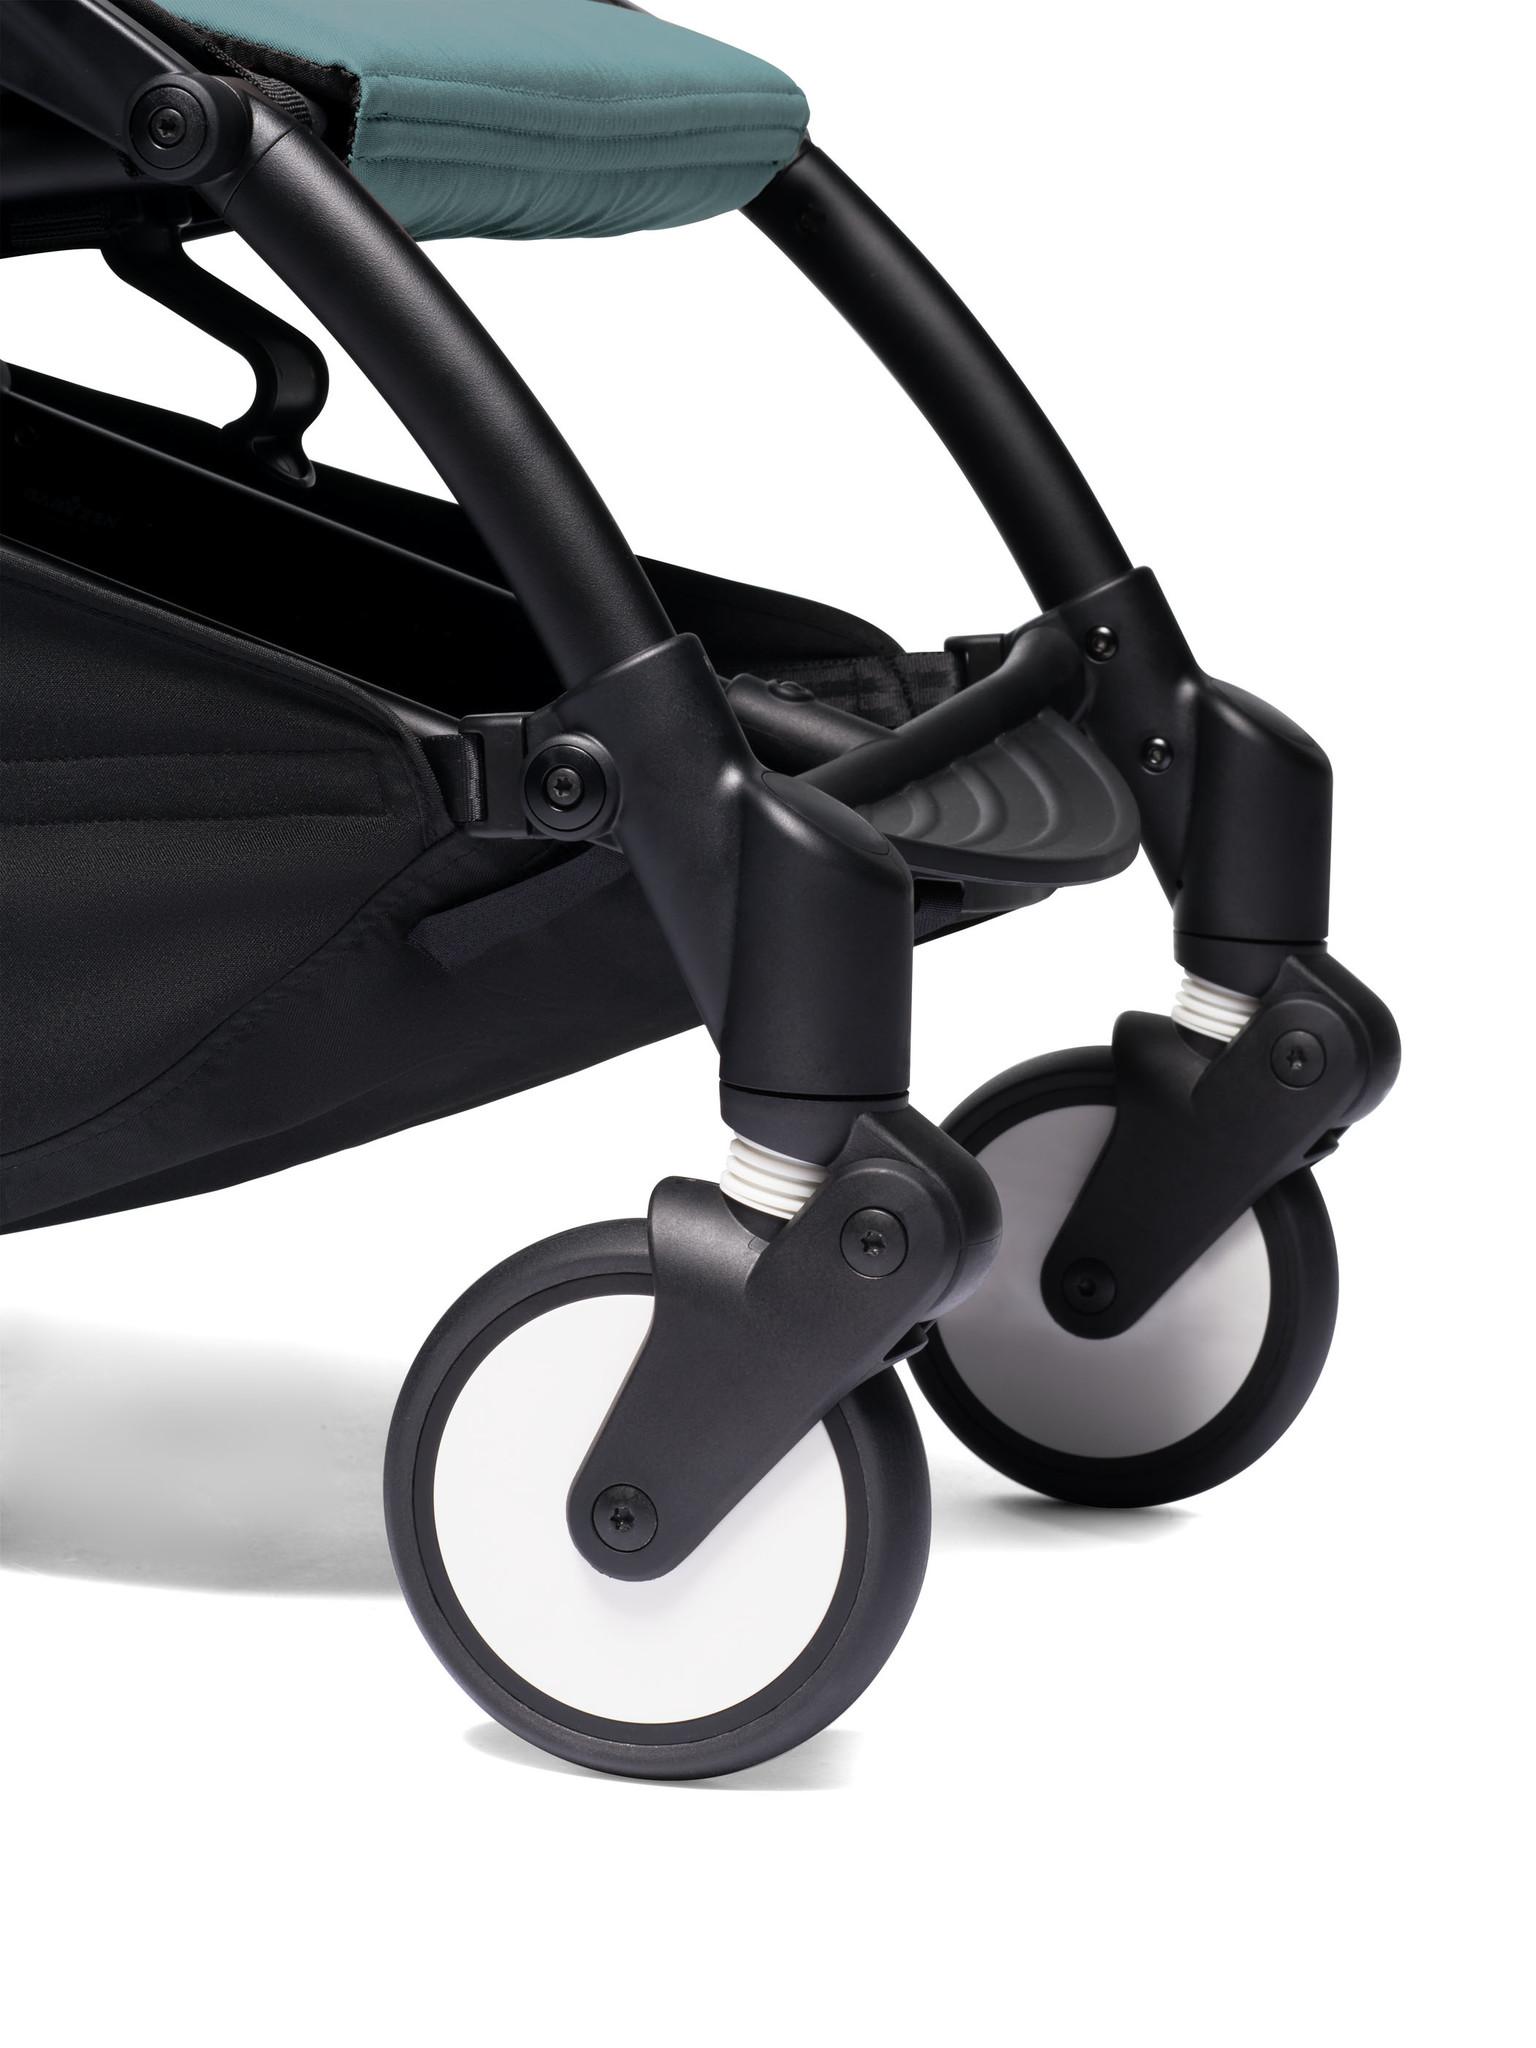 Babyzen Babyzen YOYO² buggy COMPLEET / FULL SET 0+ and 6+ aqua frame zwart